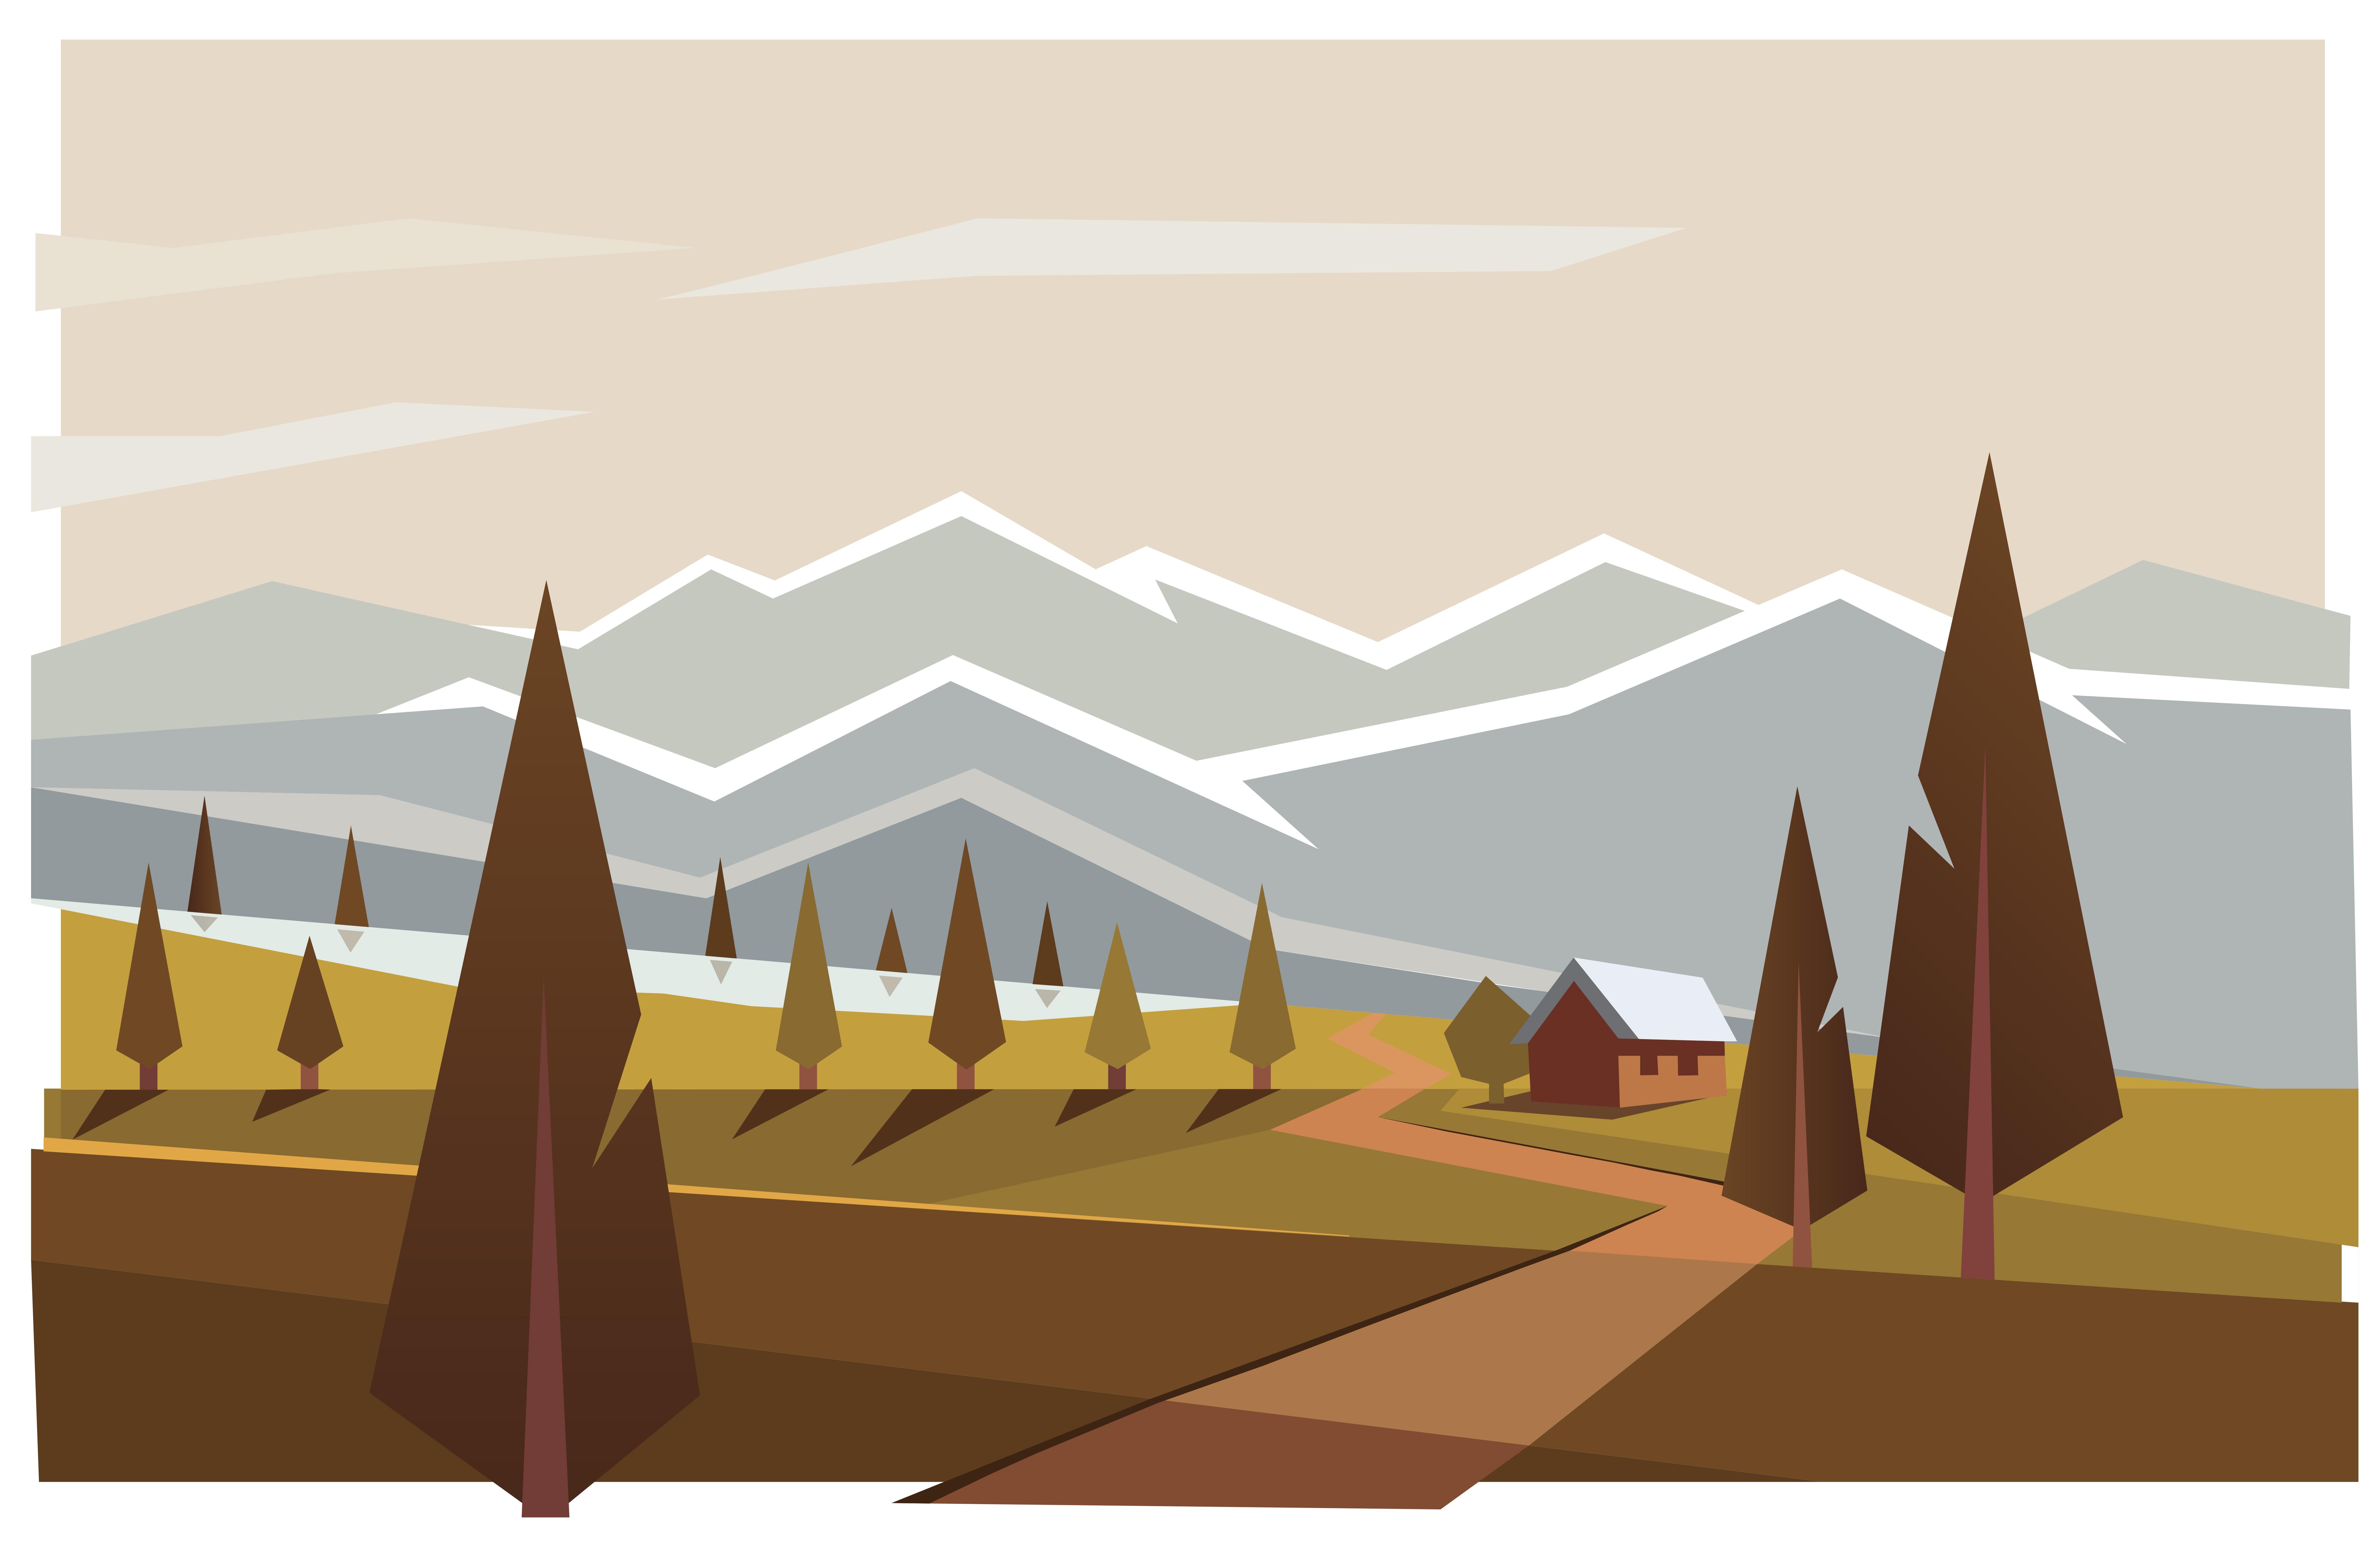 Landscape Minimalist Mountain Tree 9381x6104